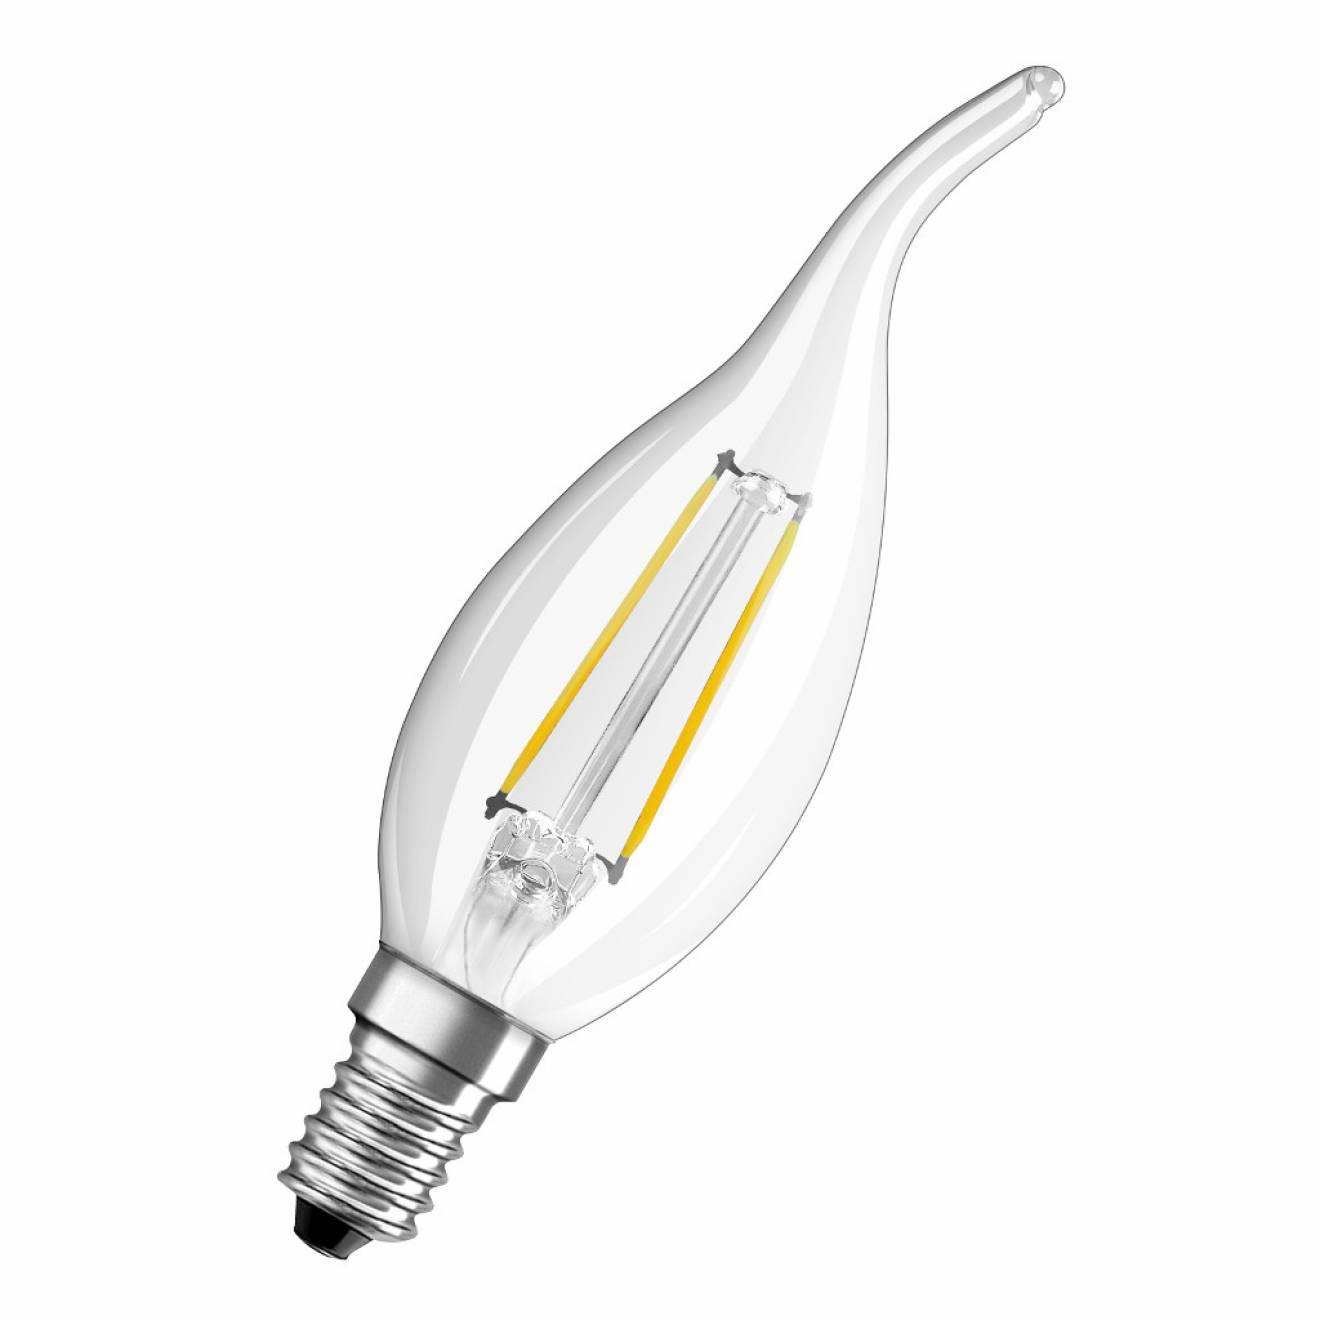 osram parathom filament ba23 2w 827 fl led candle lamp warm white not dimmable. Black Bedroom Furniture Sets. Home Design Ideas